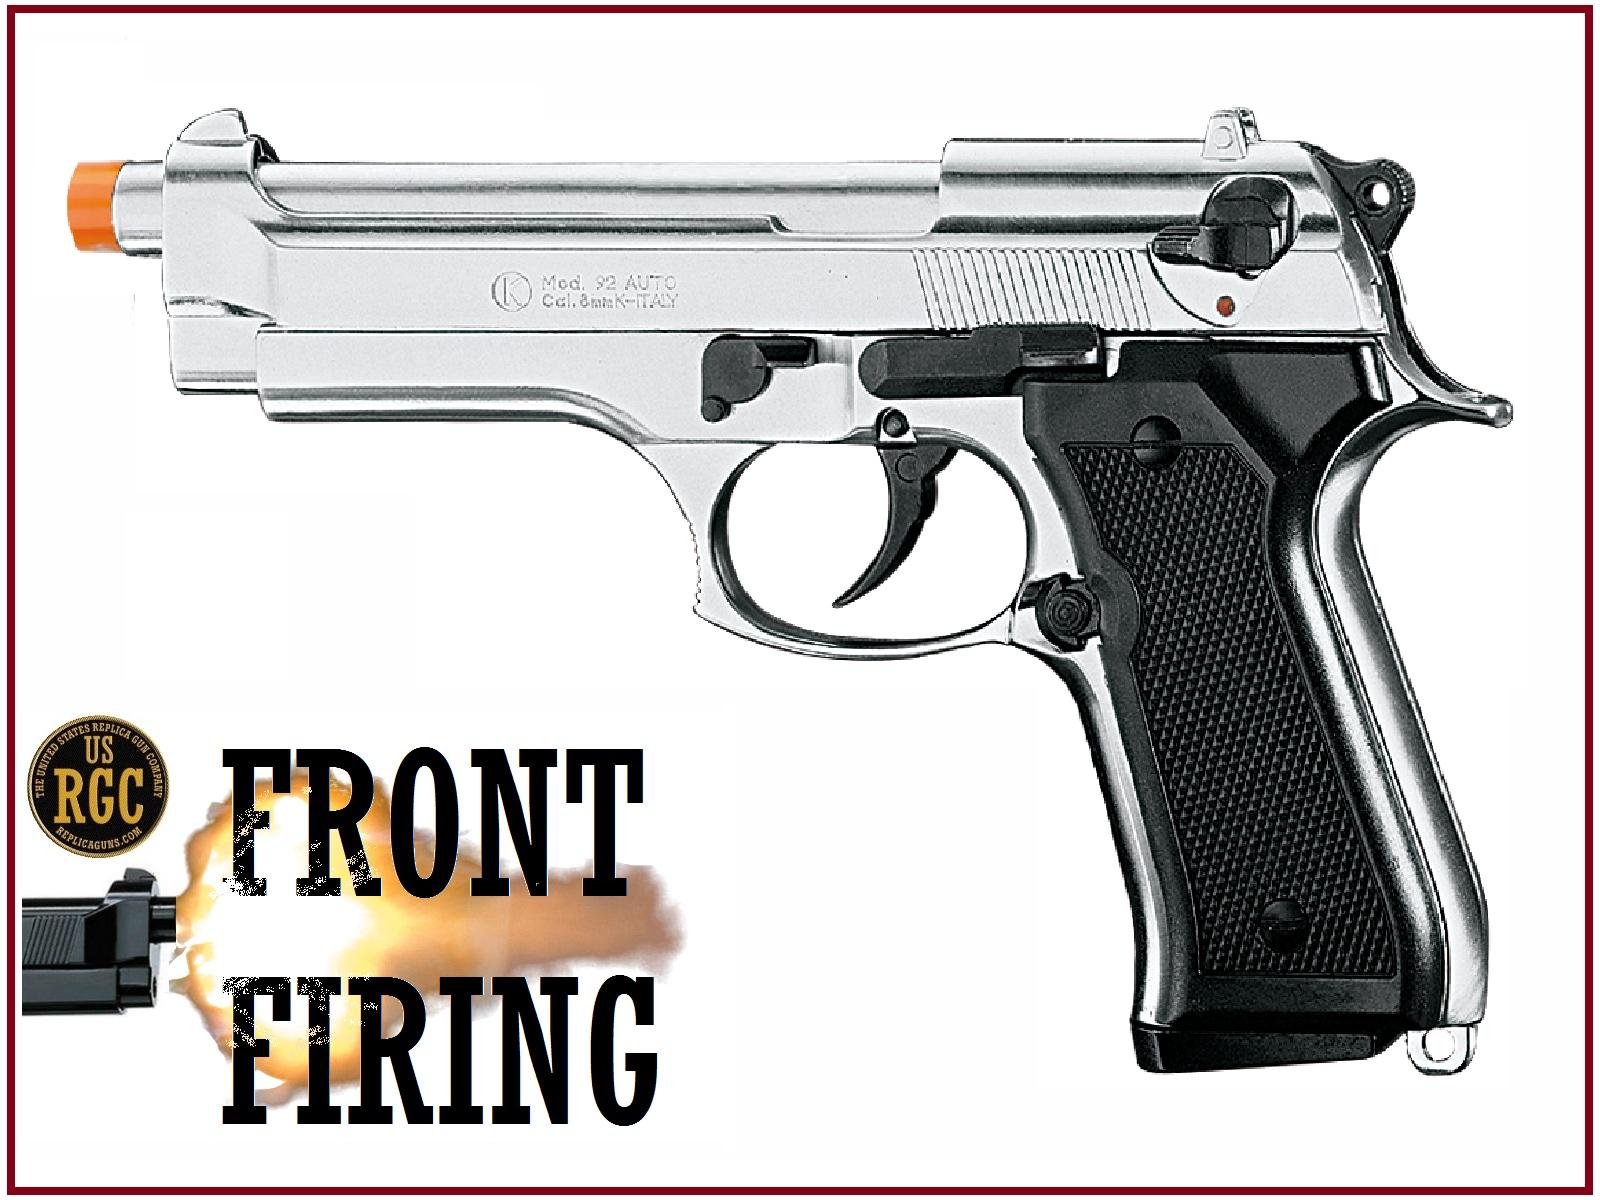 FRONT FIRE 9mm Blank Gun Kimar Beretta 92 SBF Nickel Pistol